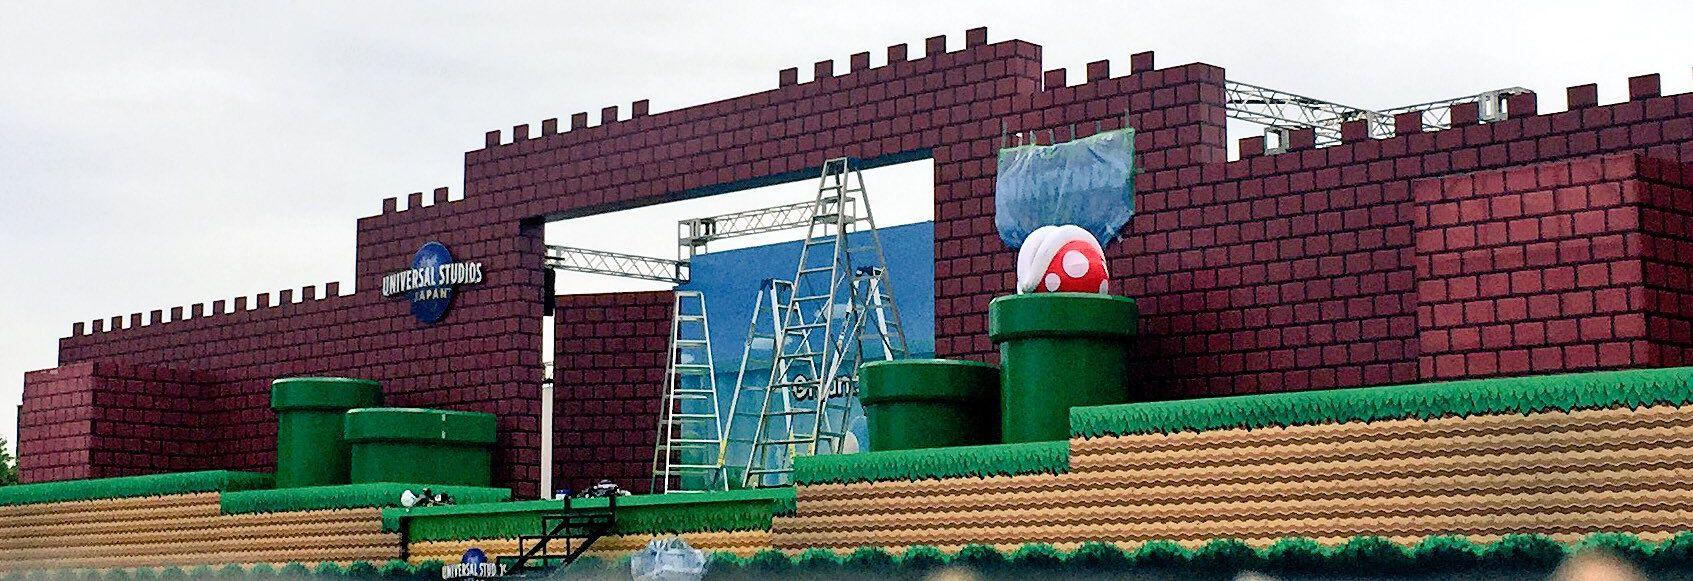 Images of Nintendo World at Universal Studios Japan crop up screenshot